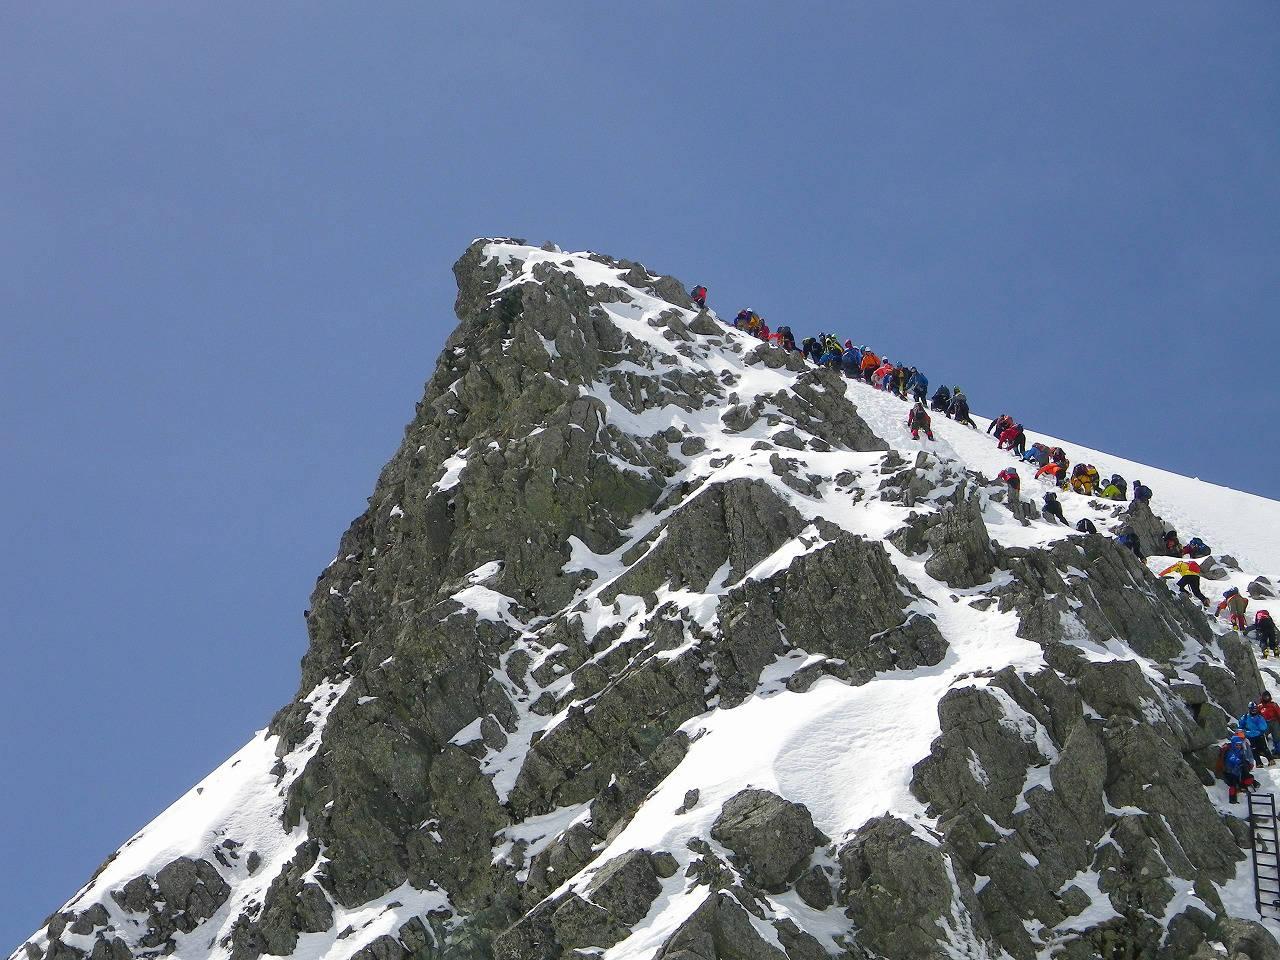 【雪山登山Ⅱ】八ヶ岳・赤岳